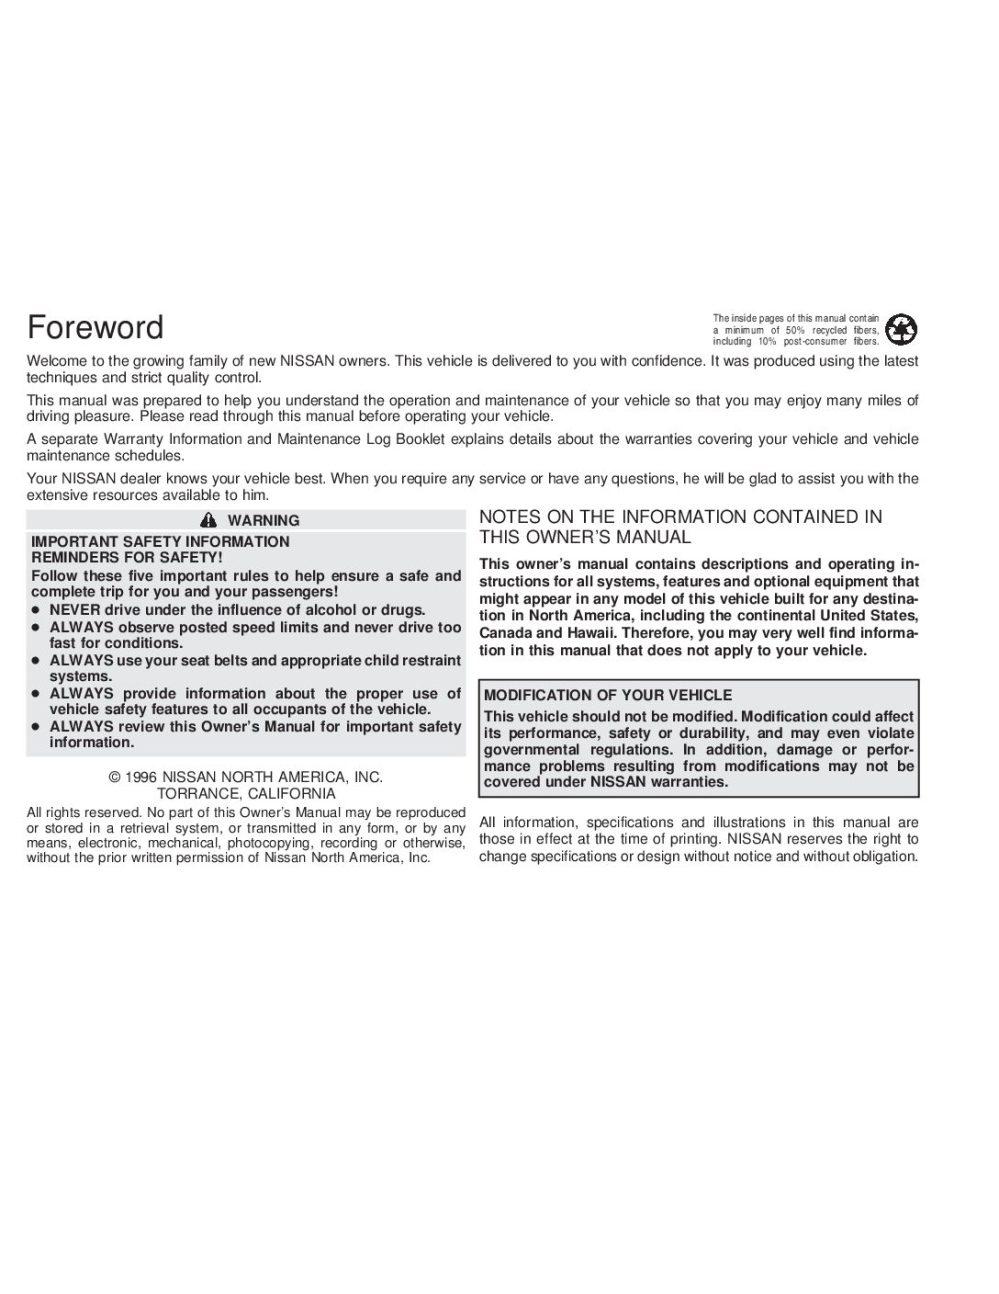 medium resolution of 1997 nissan altima owner s manual